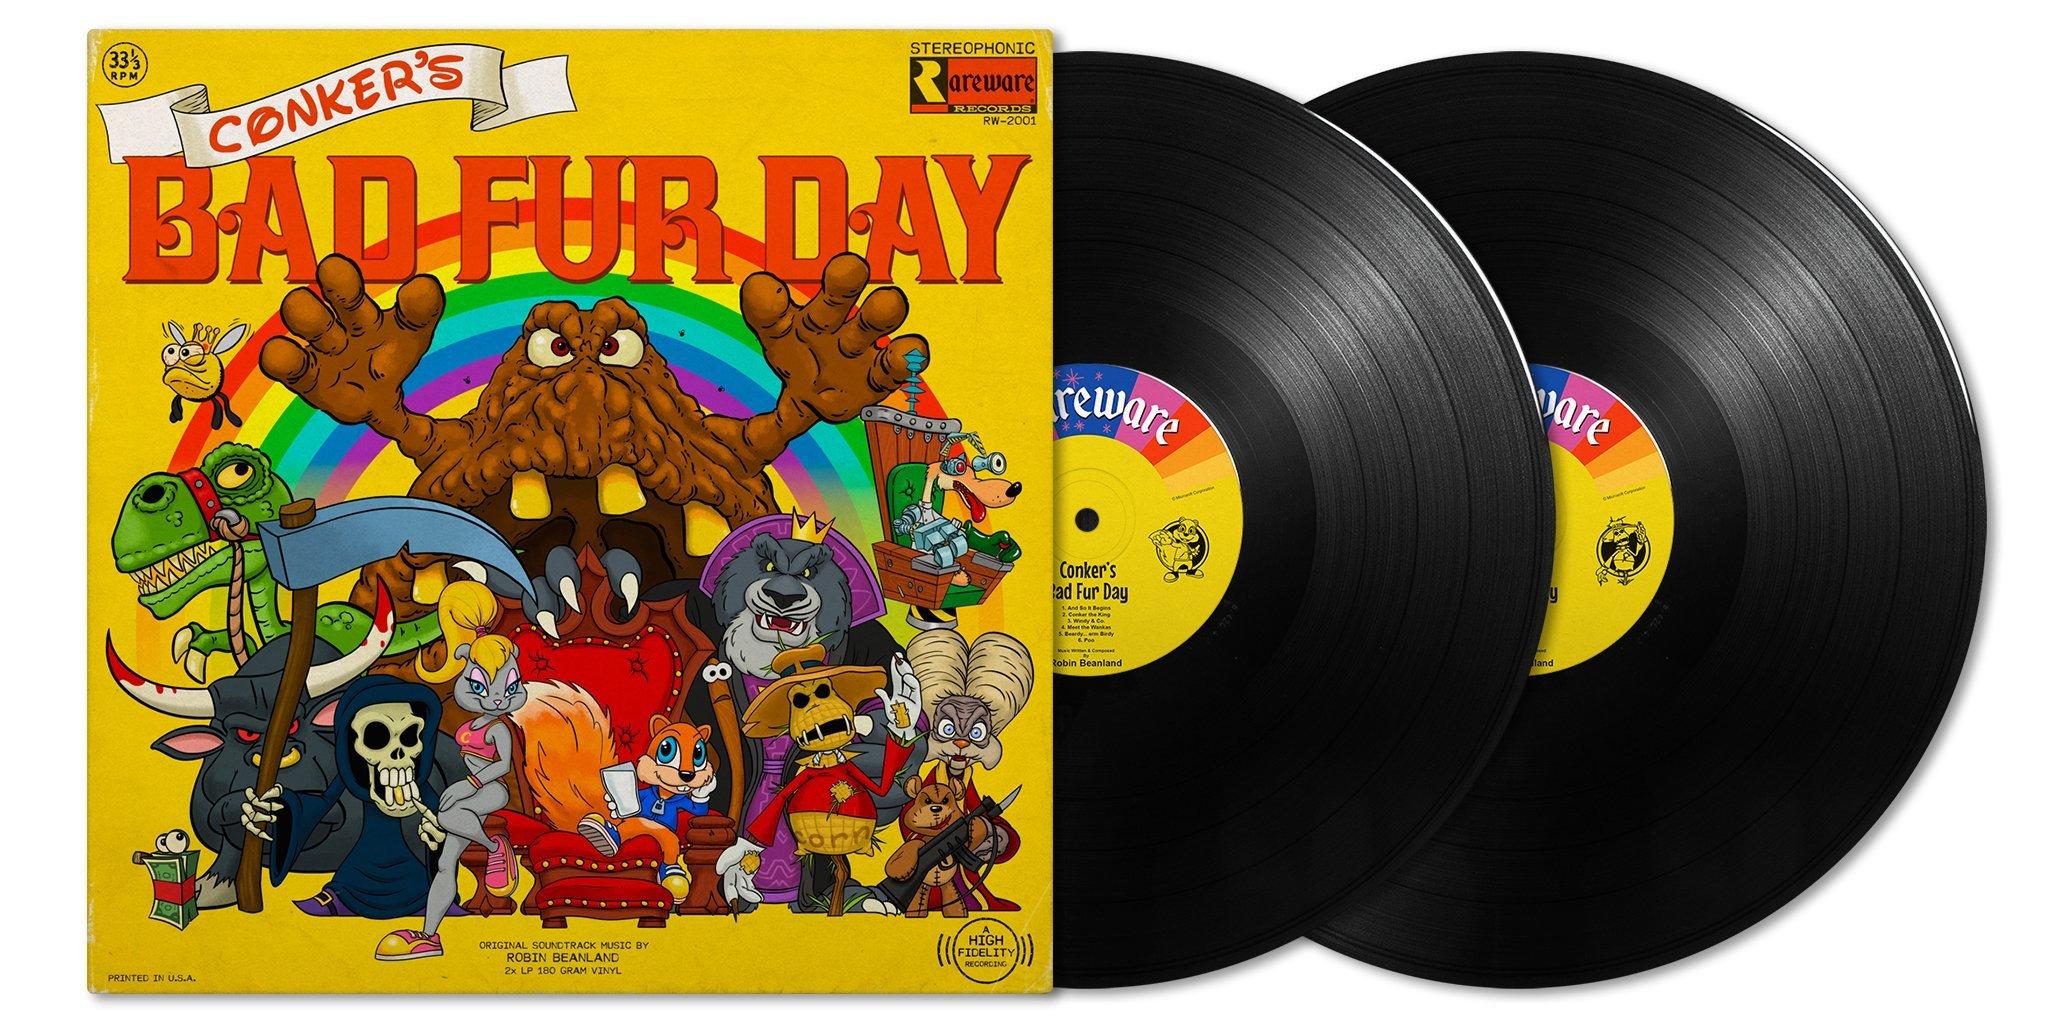 Conker's Bad Fur Day / コンカーズ・バッド・ファー・デイ(オリジナル・サウンドトラック)2LP - 画像2